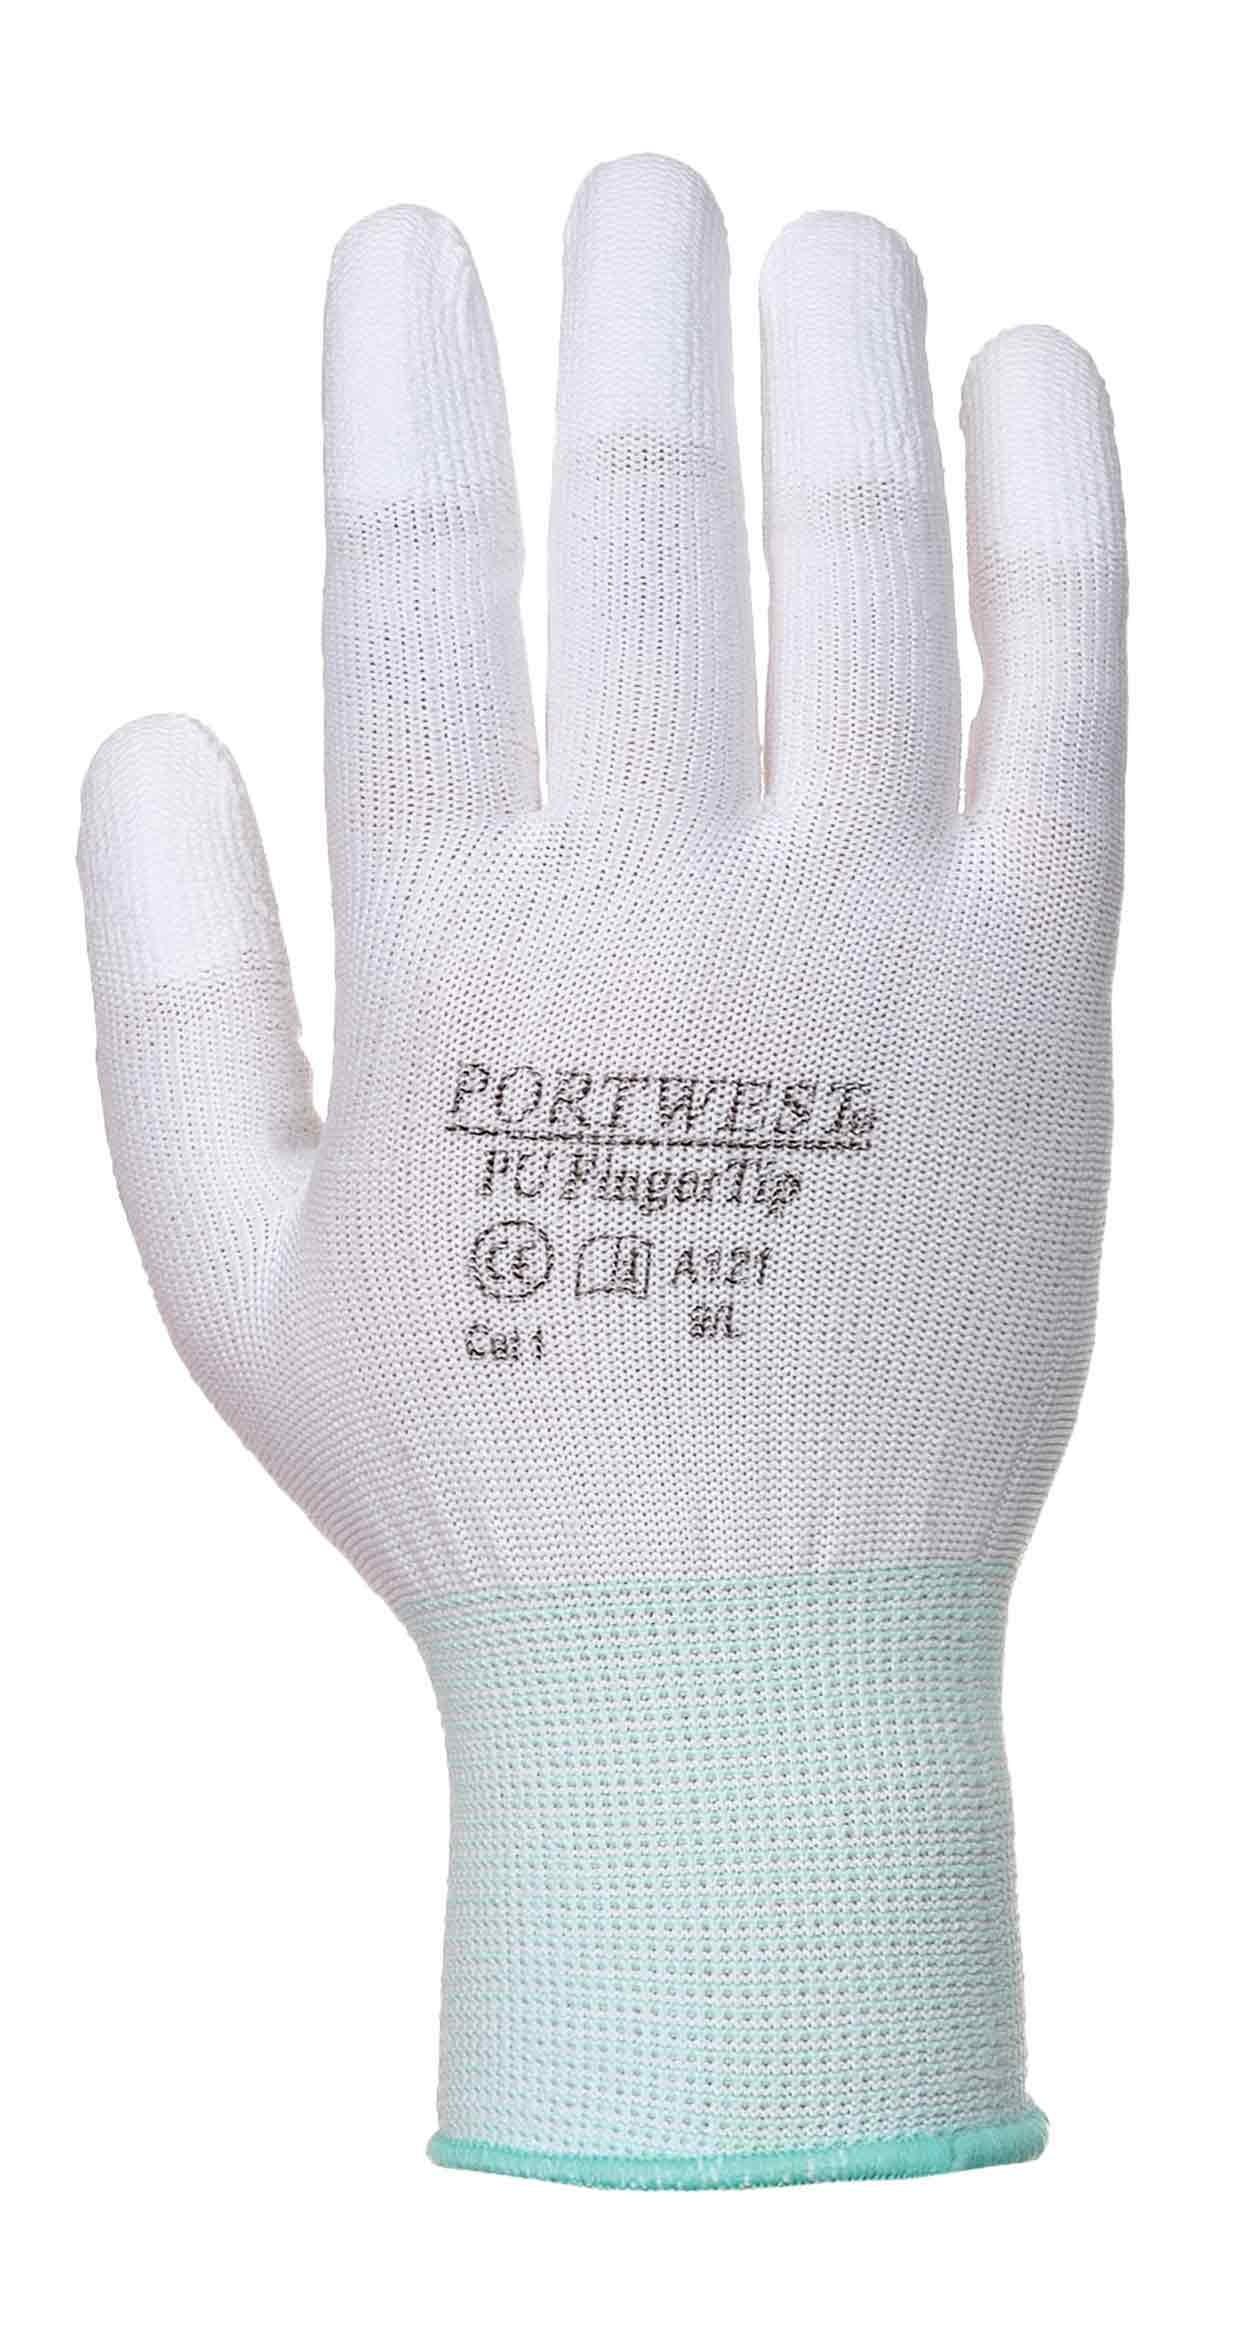 Leather work gloves screwfix - Portwest A121 Pu Fingertip Glove